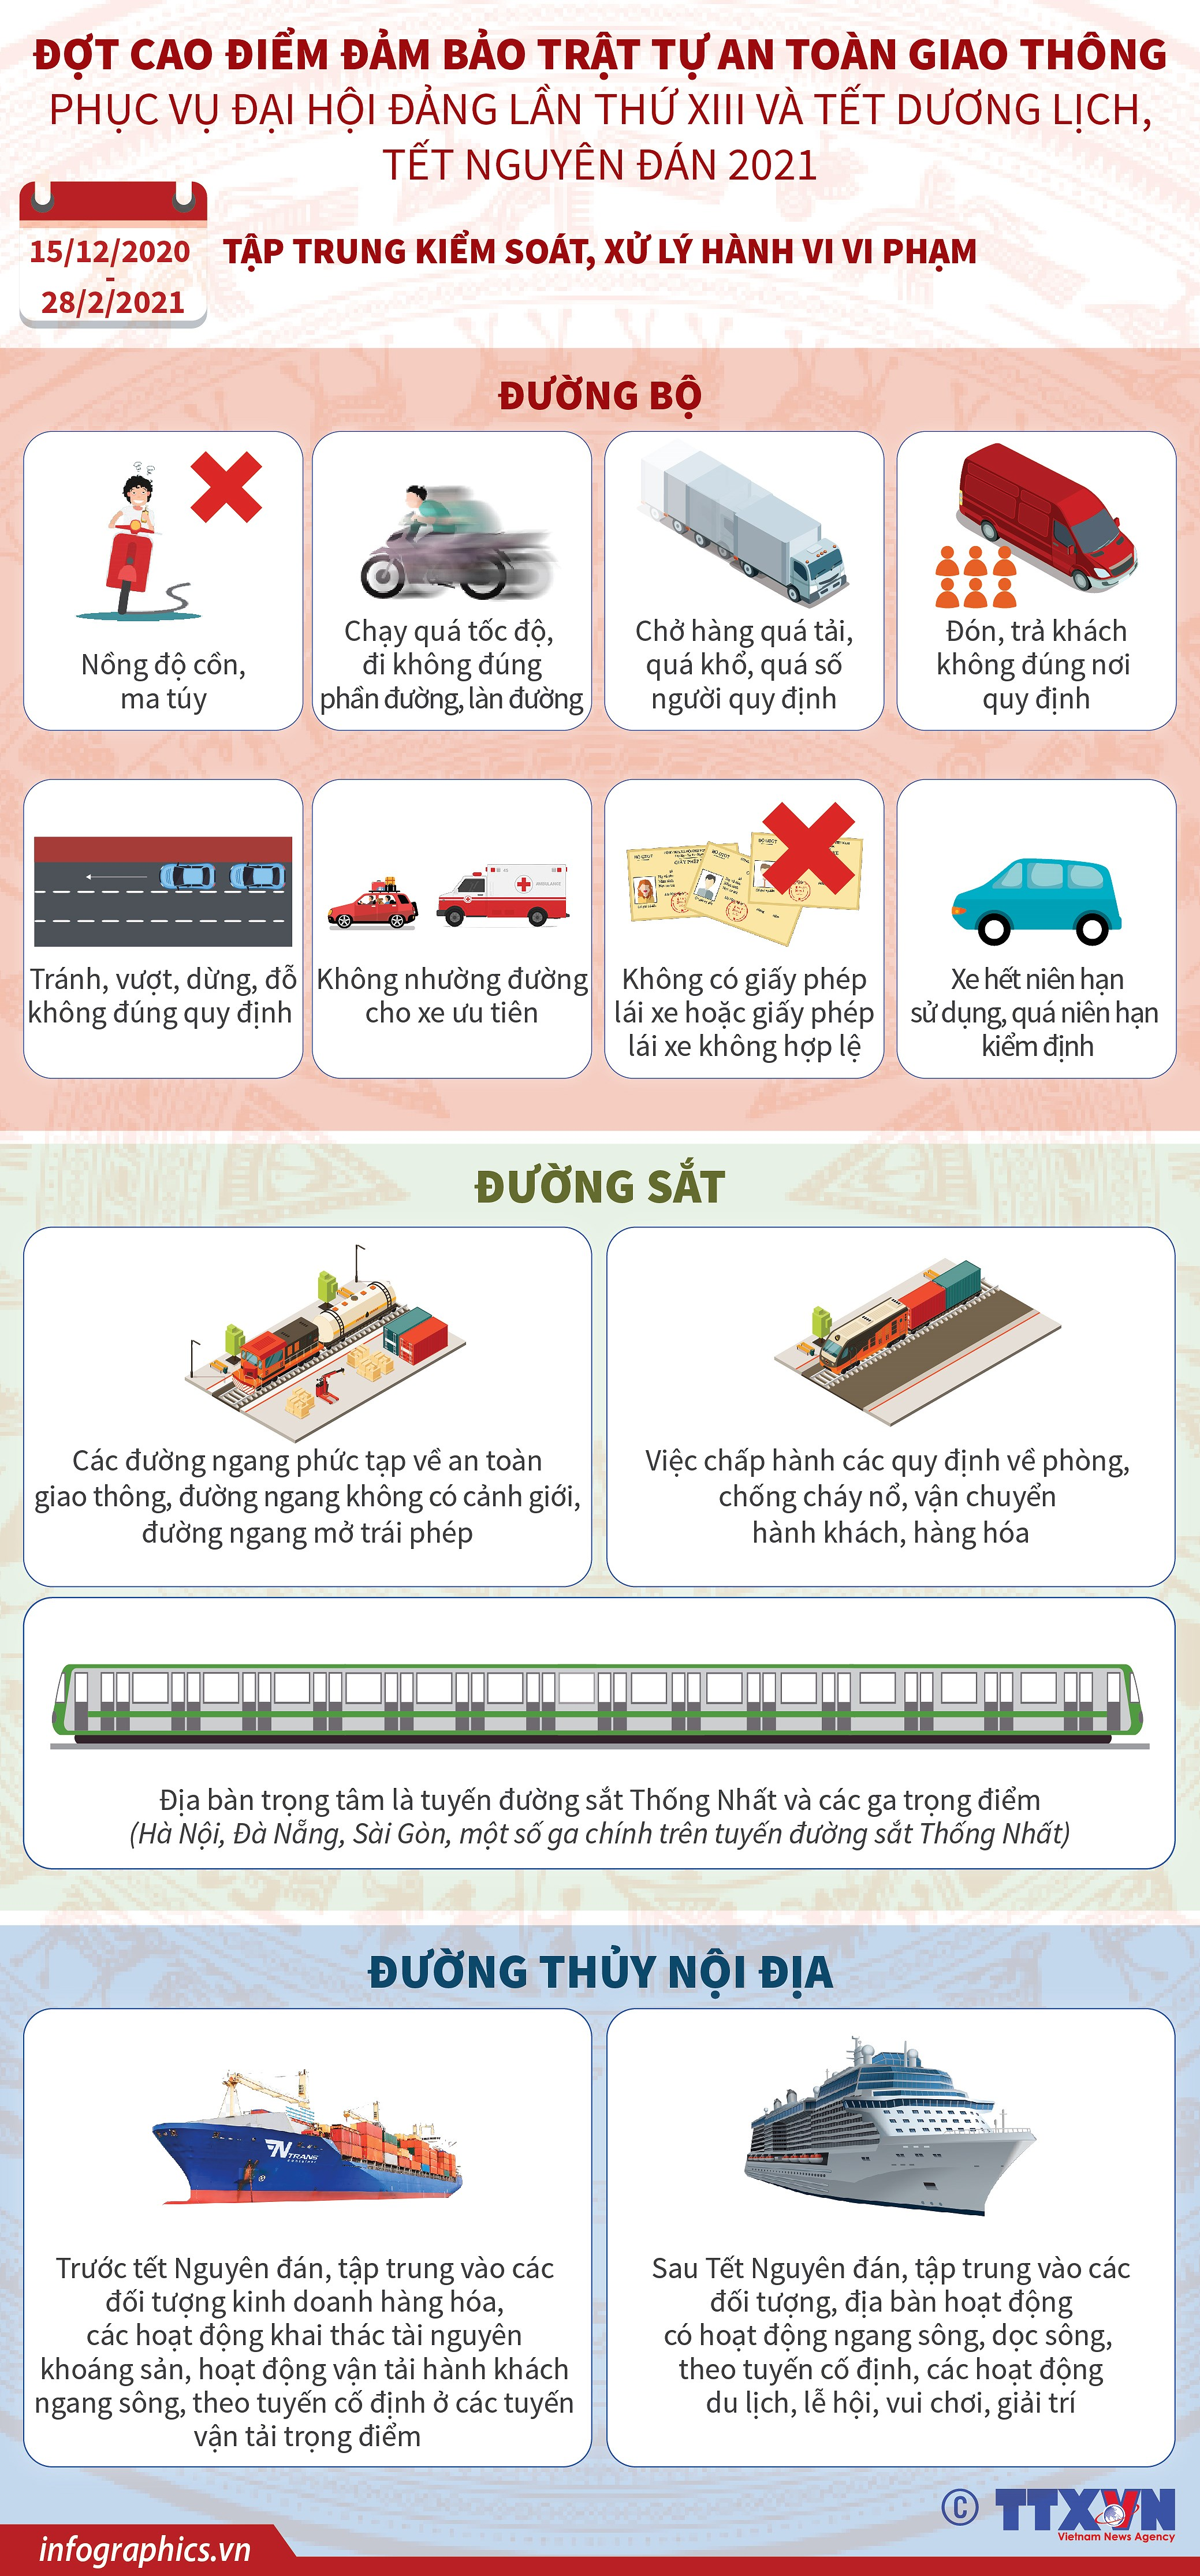 [Infographics] Dam bao trat tu an toan giao thong phuc vu Dai hoi Dang hinh anh 1